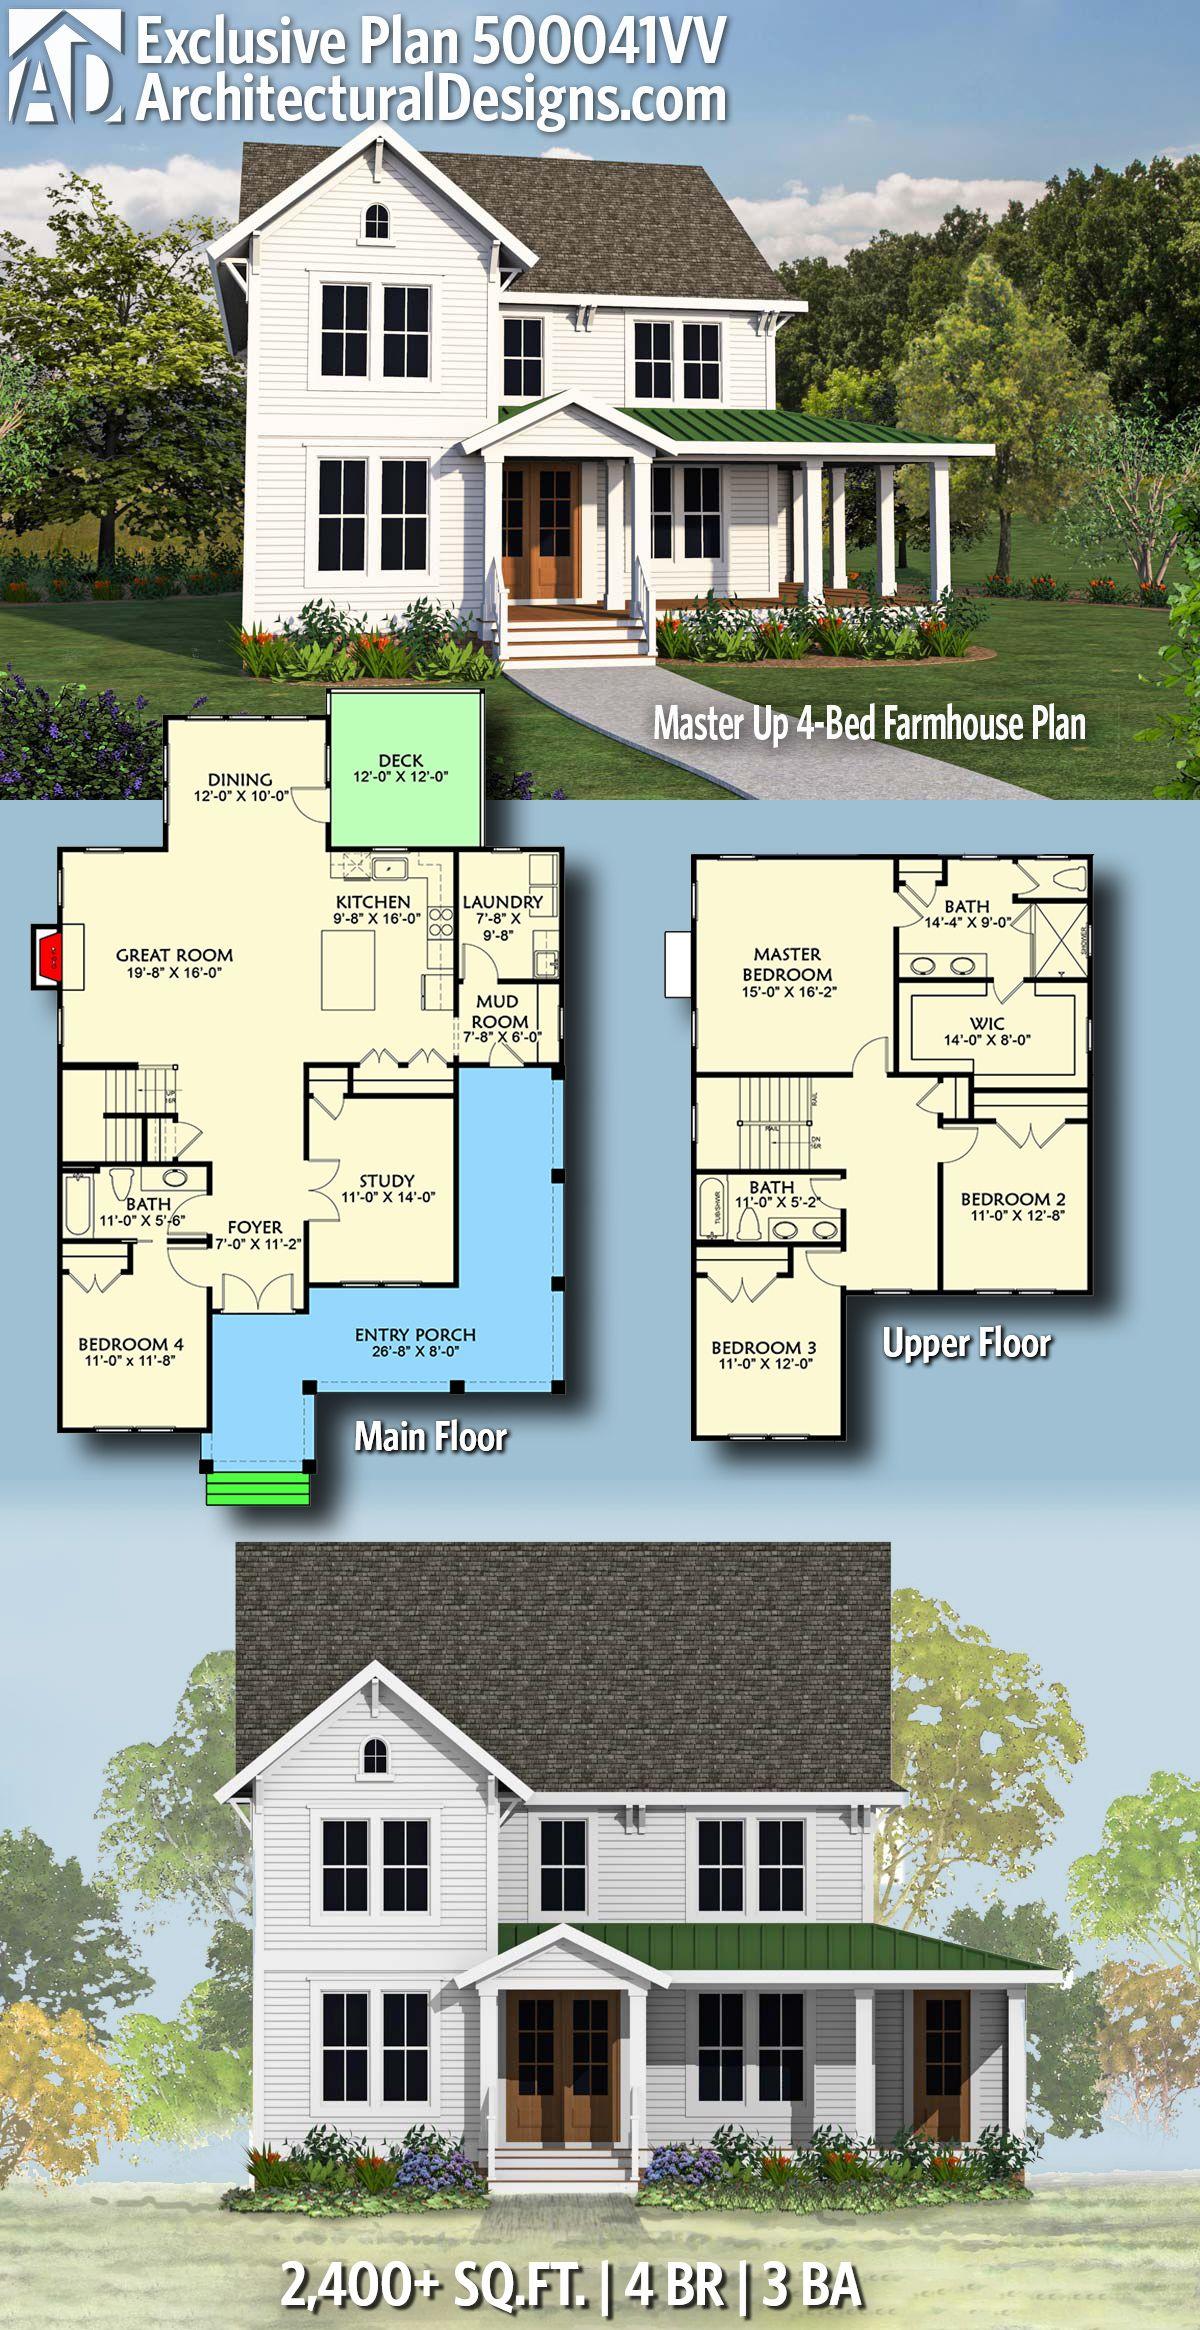 Architectural Designs Exclusive Modern Farmhouse House Plan